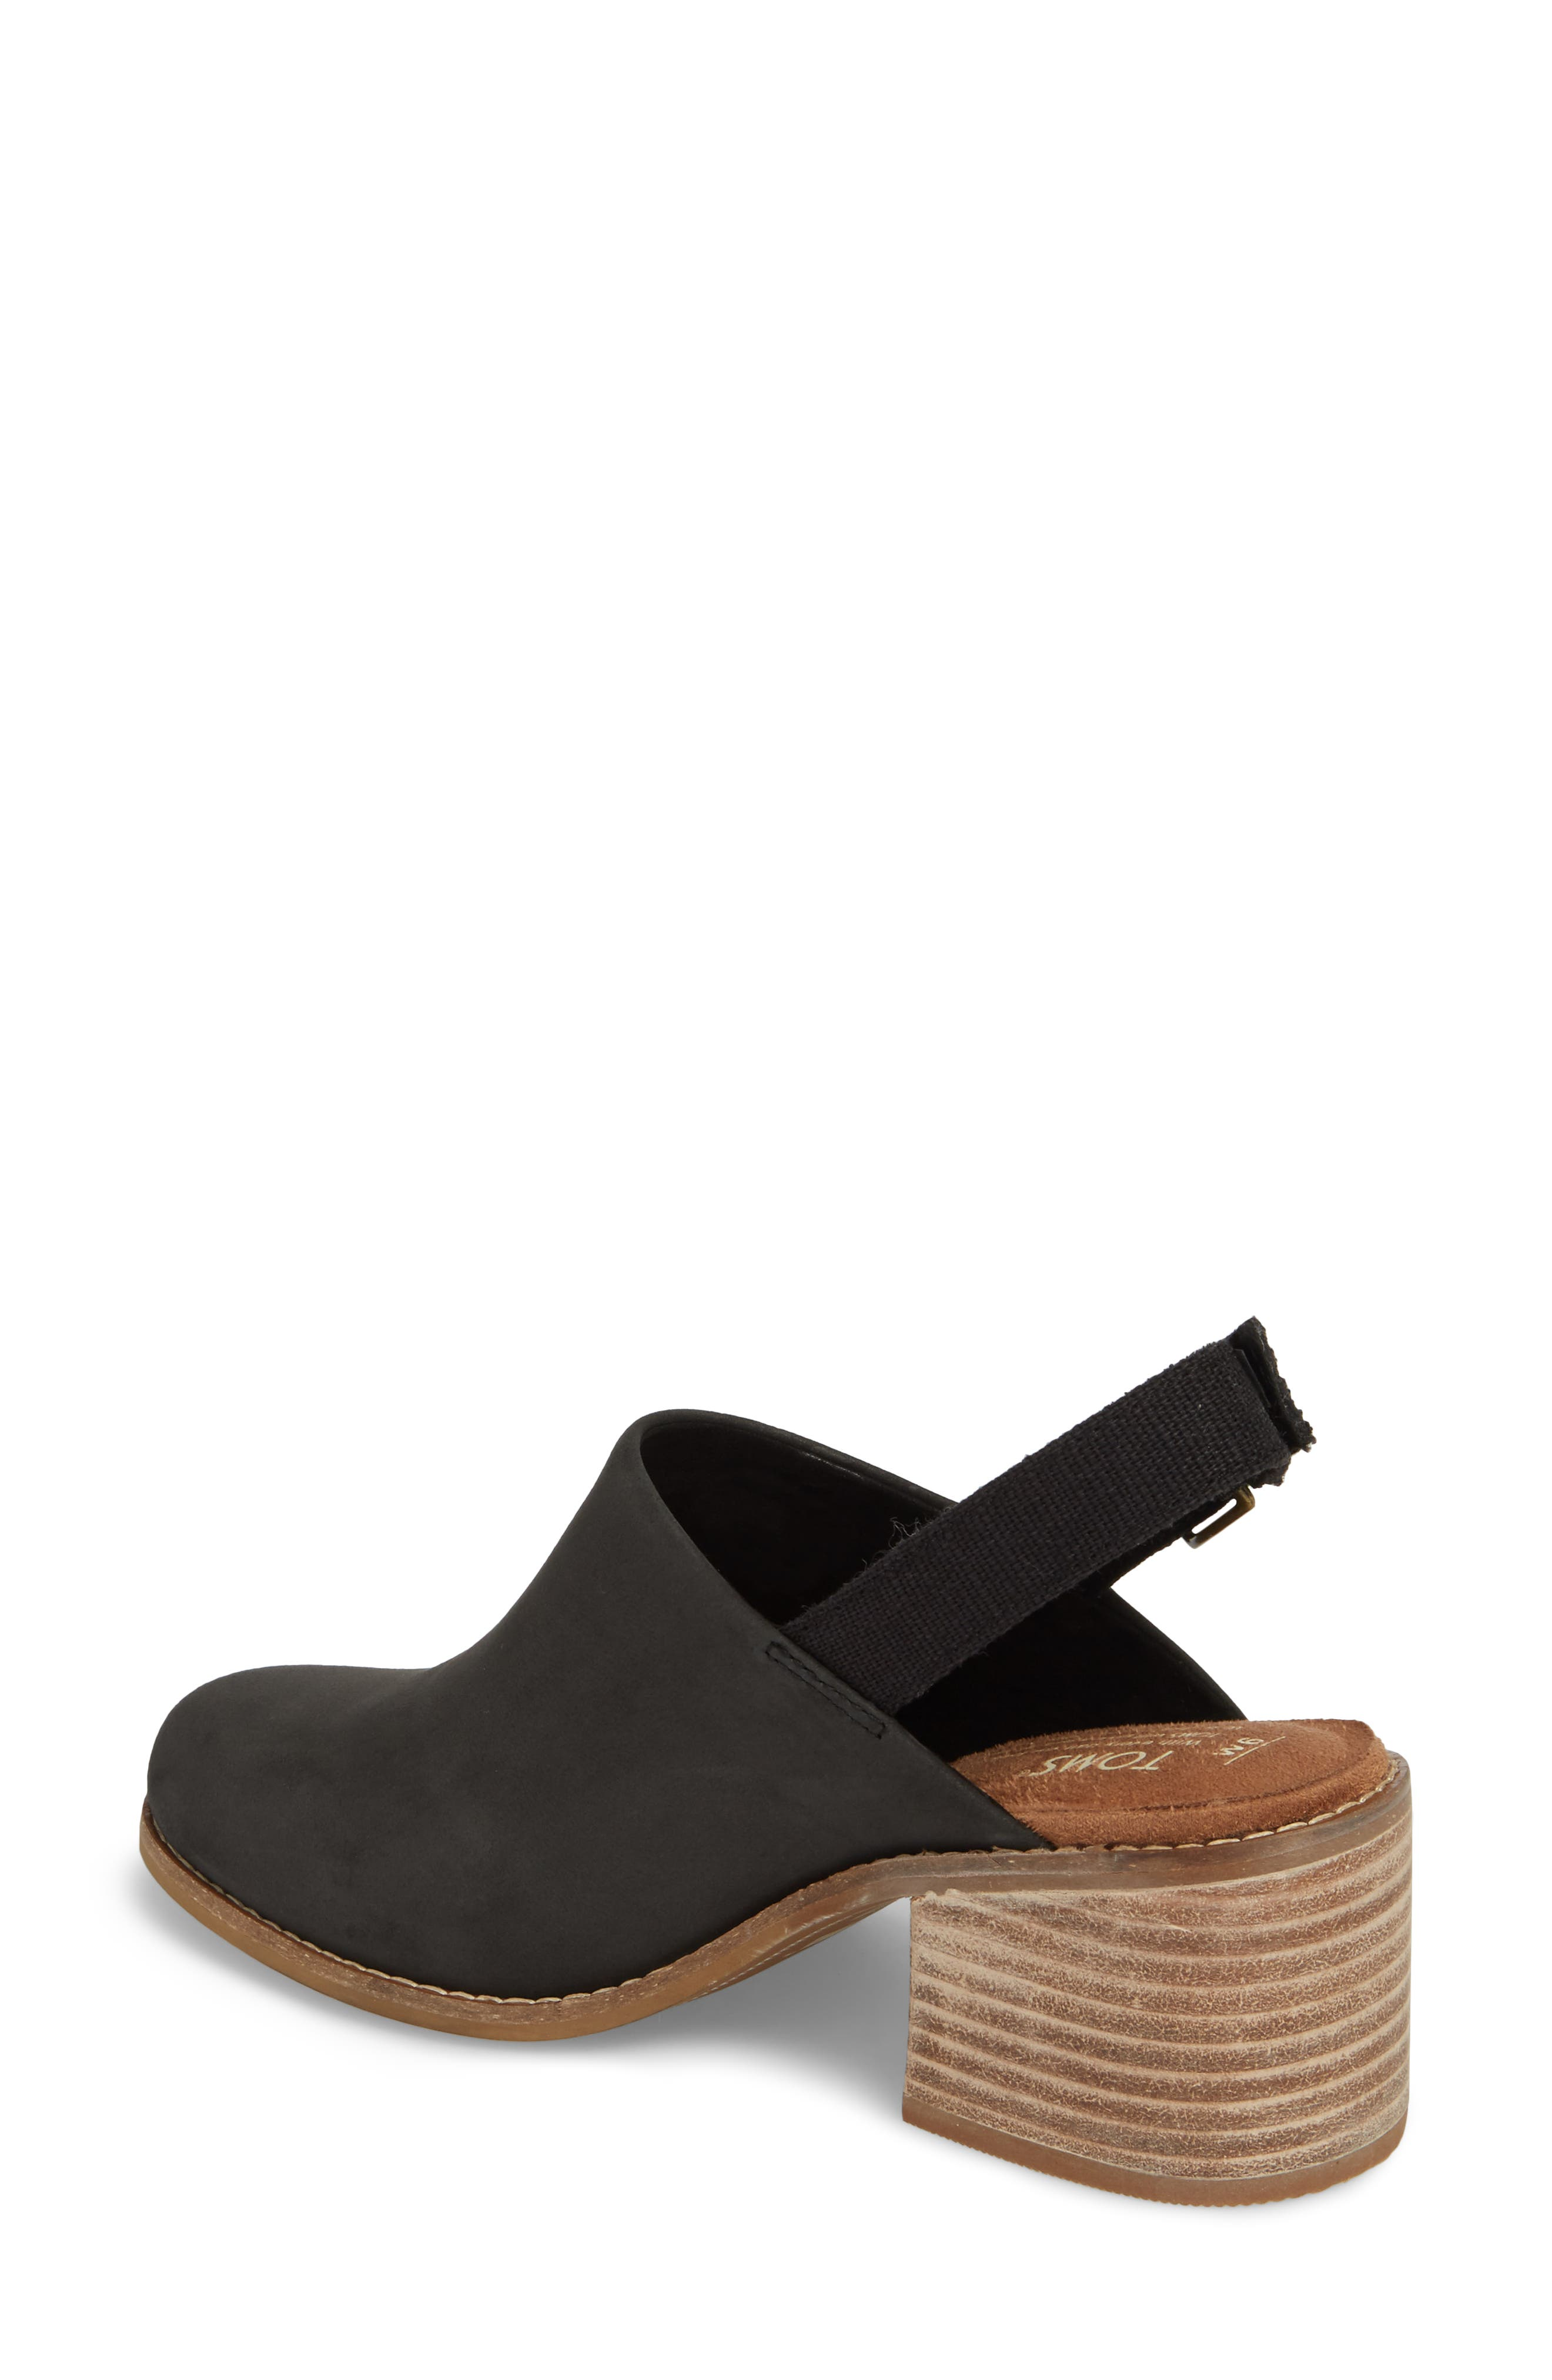 Leila Slingback Sandal,                             Alternate thumbnail 2, color,                             Black Leather